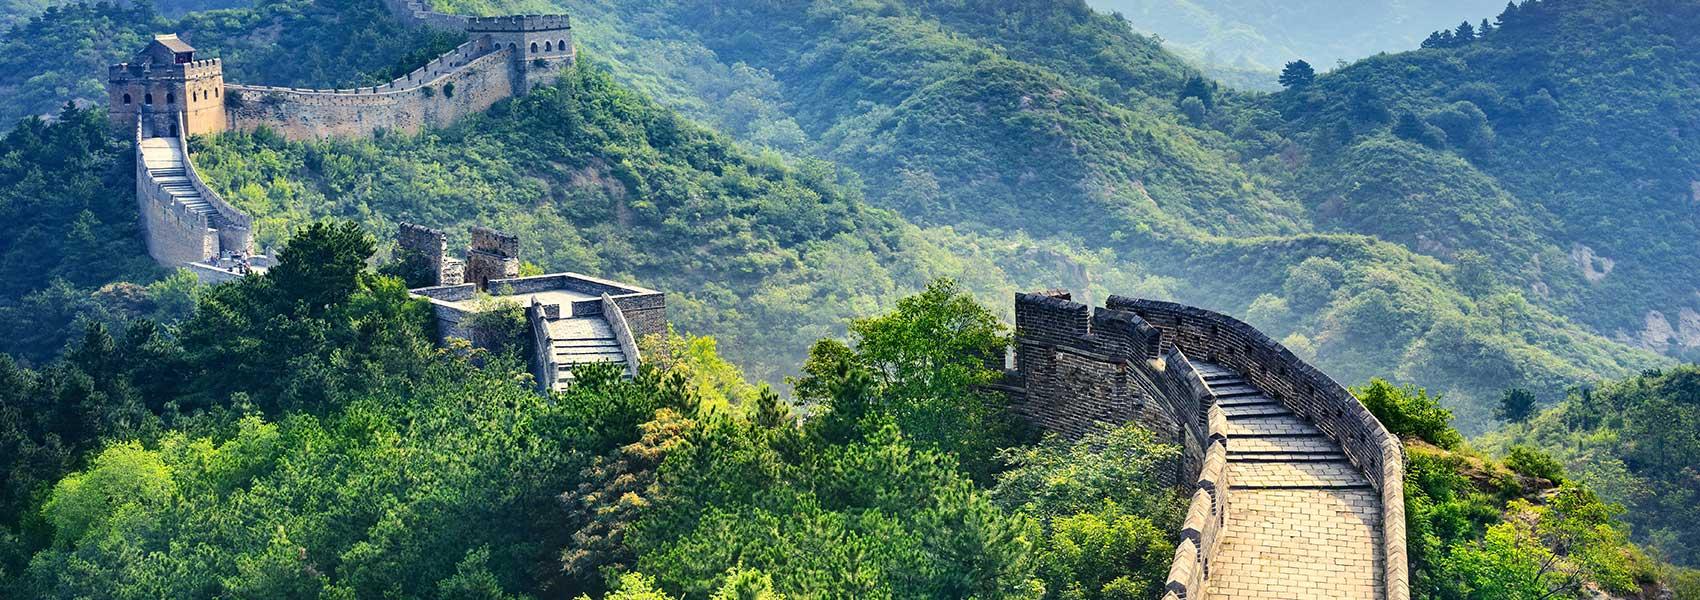 Green reform China